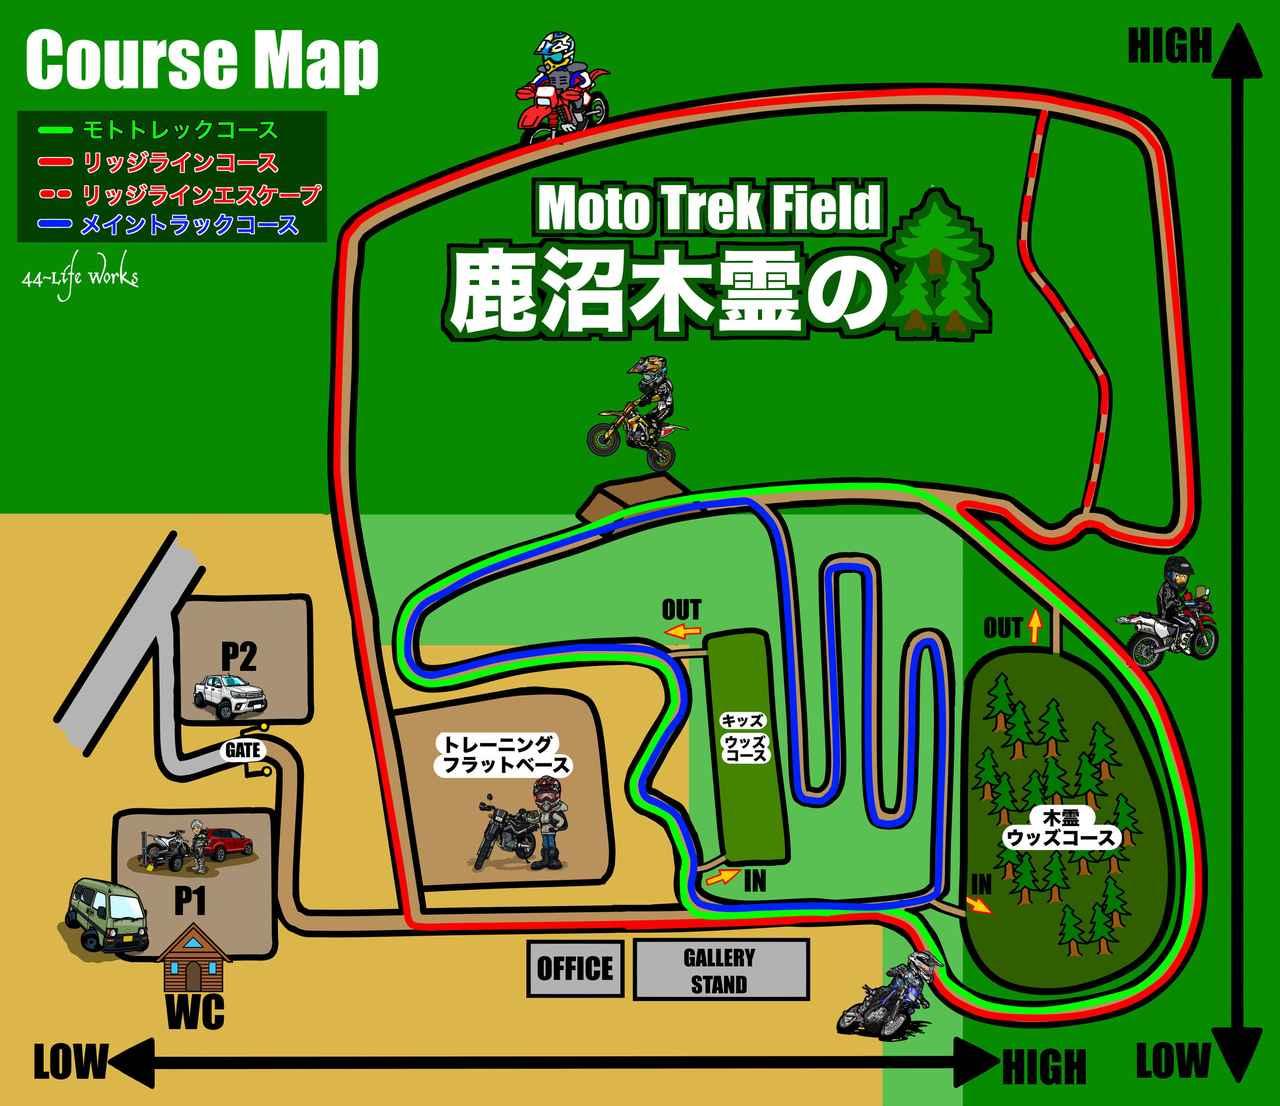 画像: 鹿沼木霊の森 Kodamanomori mototrekfield 鹿沼木霊の森   日本